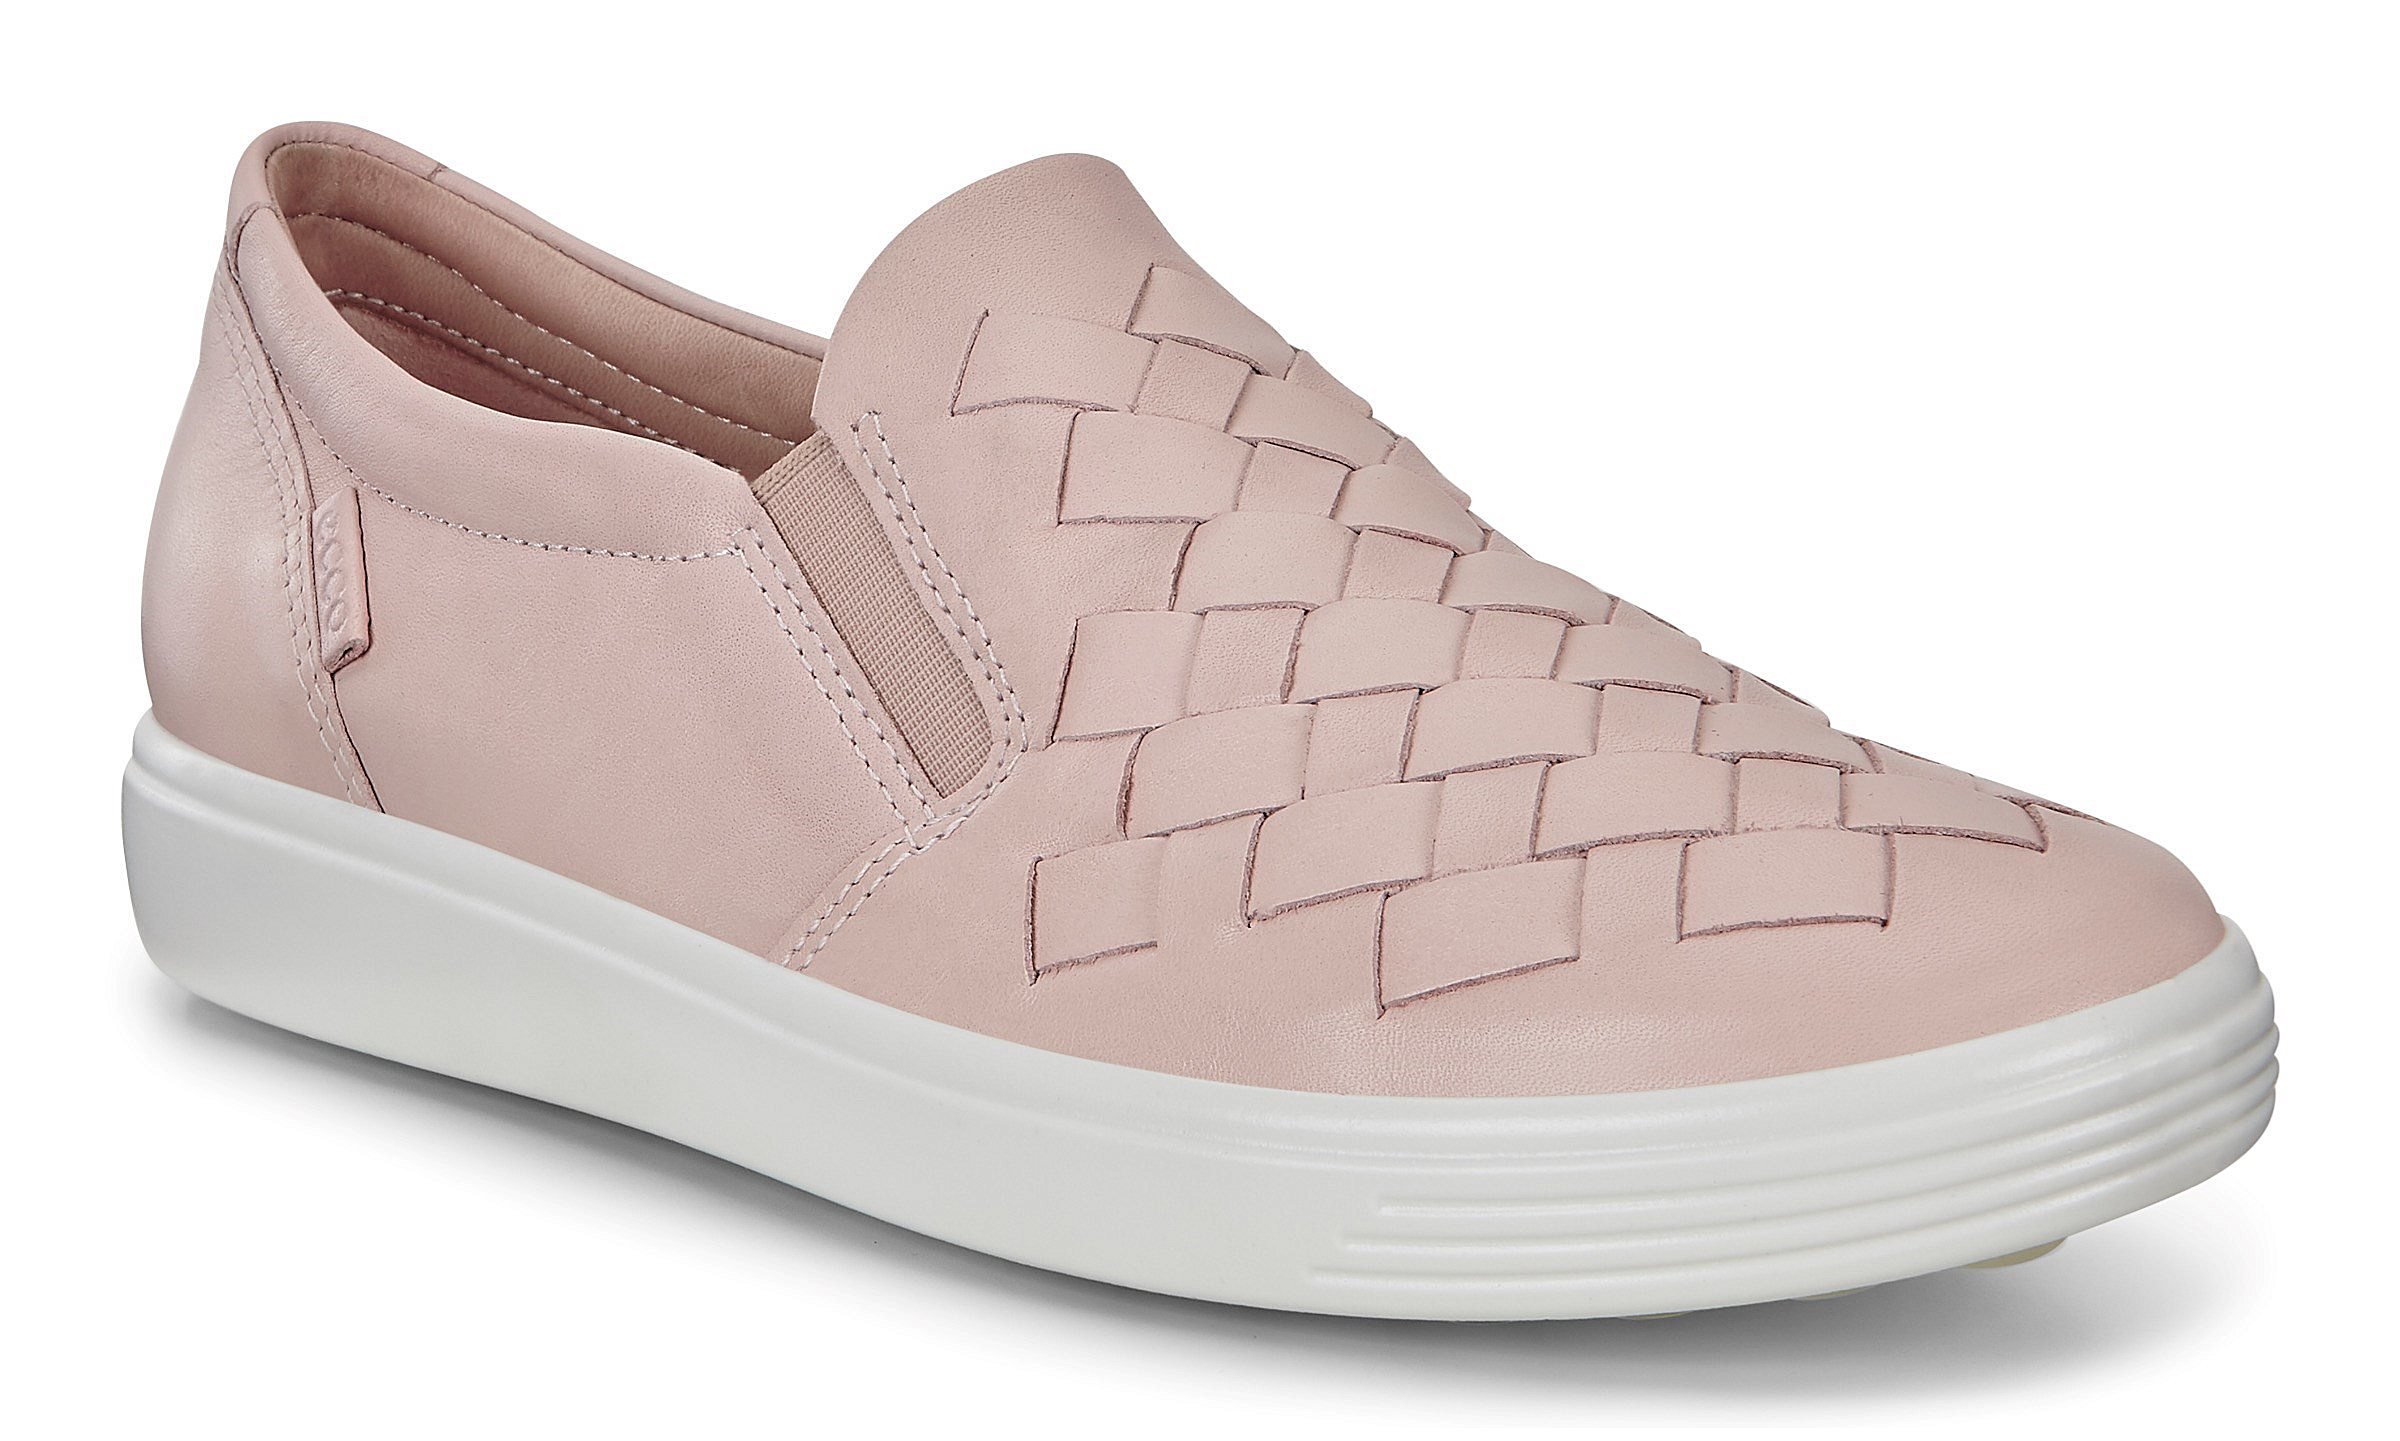 ecco sandals uk sale, Ecco mens soft 7 sneaker,ecco sandal